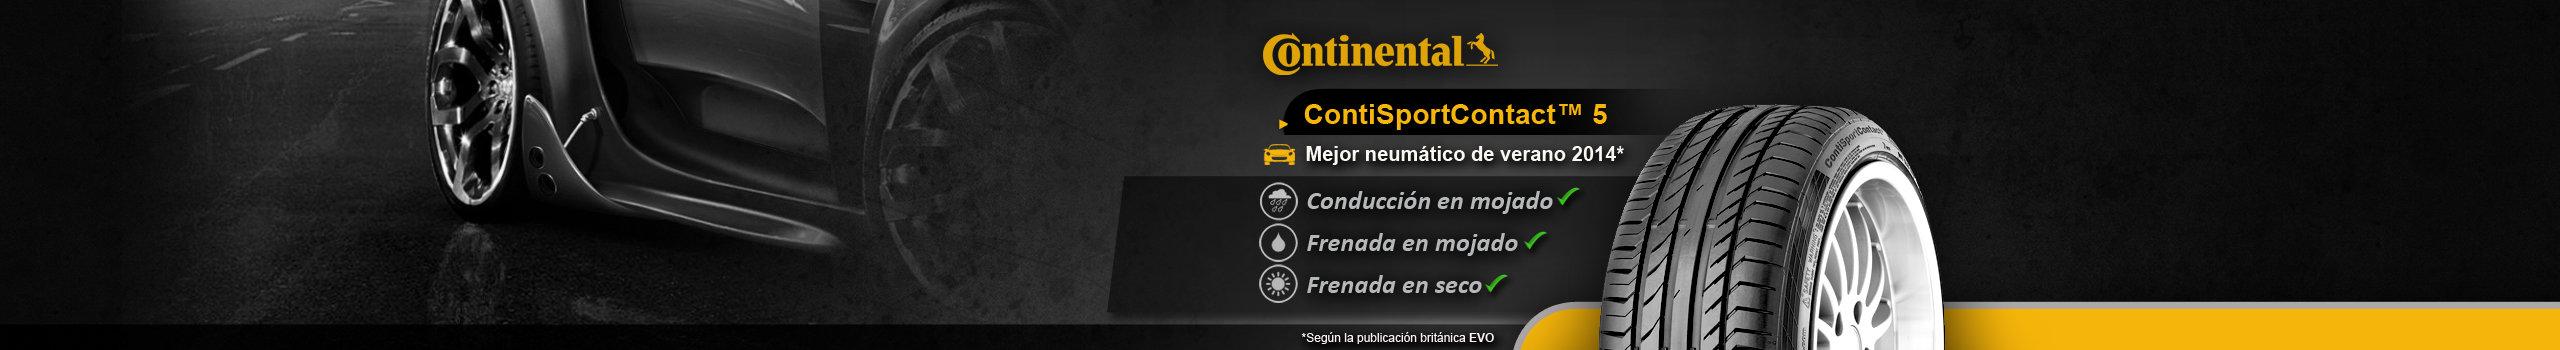 Neumático Continental ContiSportContact5